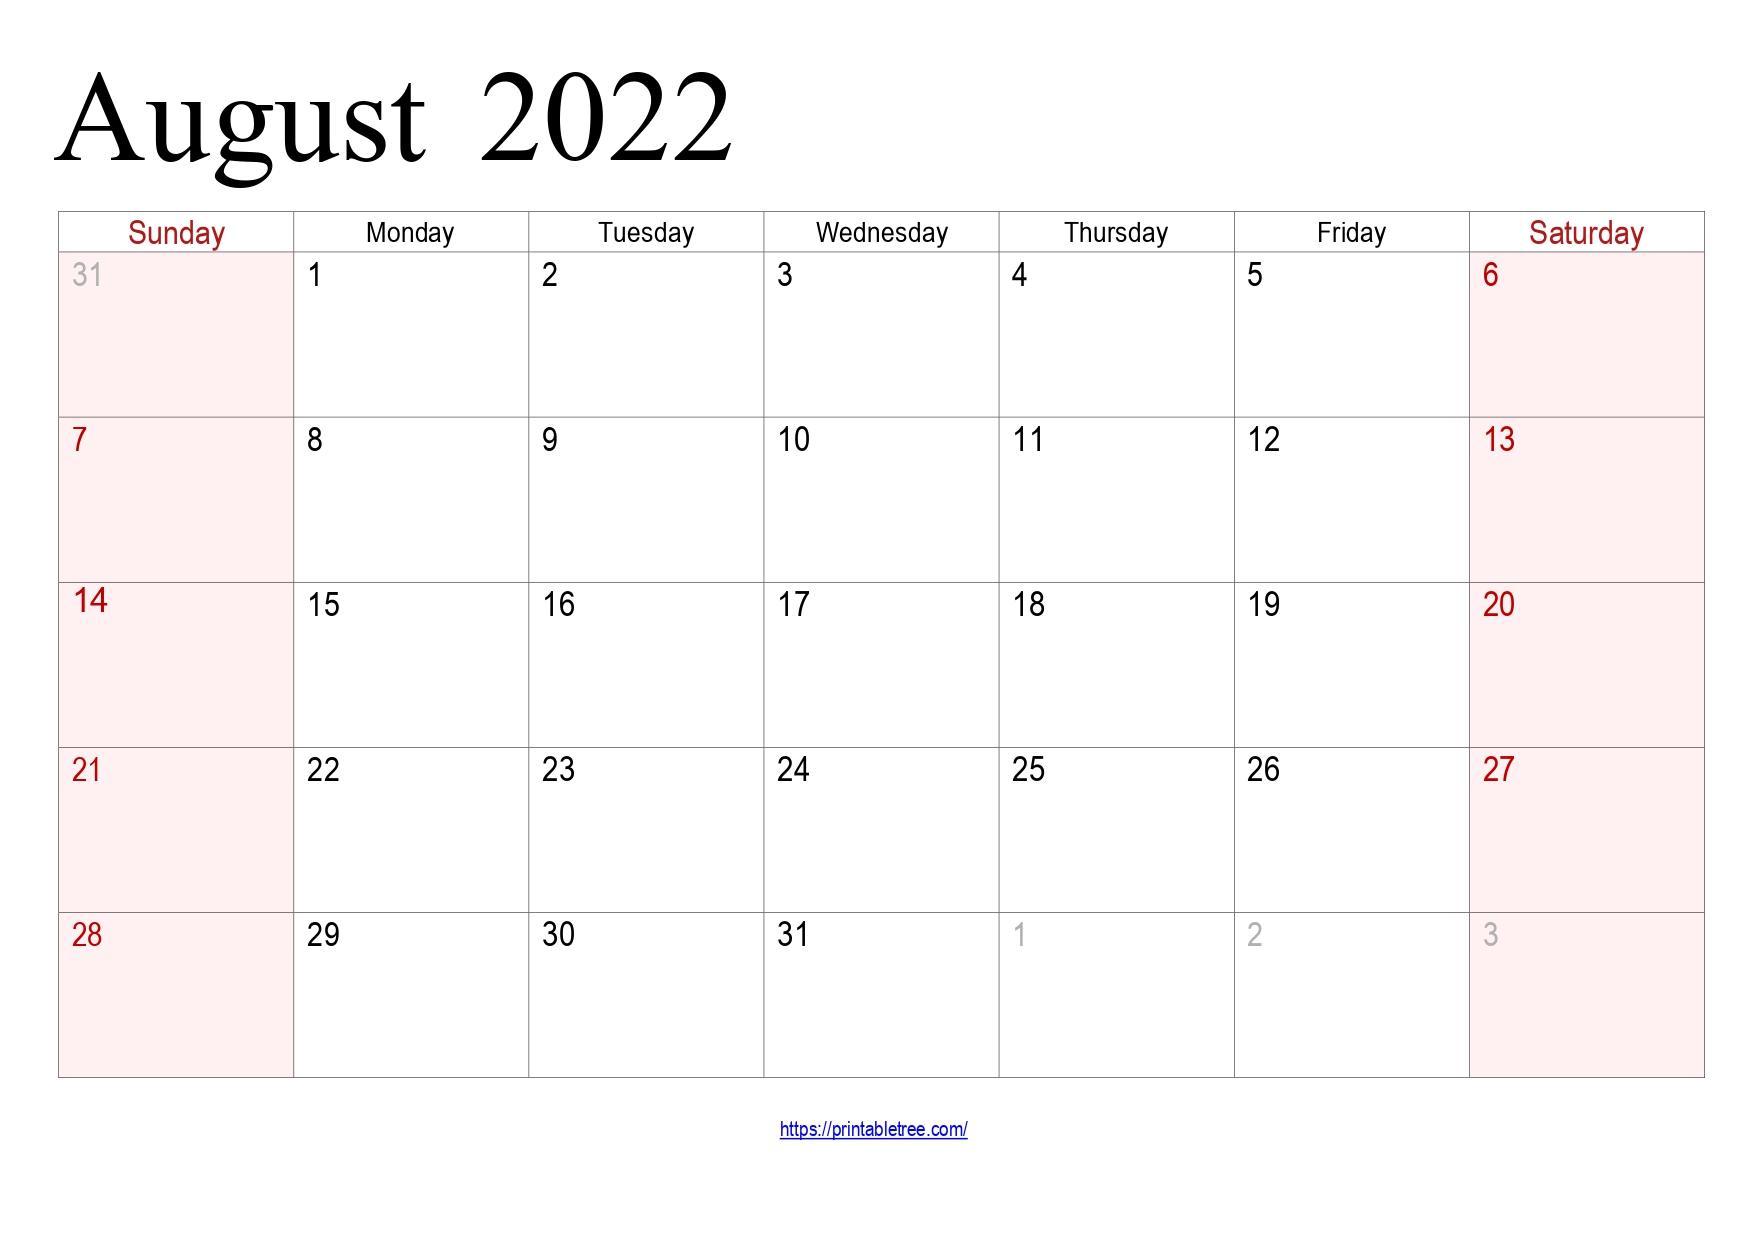 August Calendar 2022 with holidays